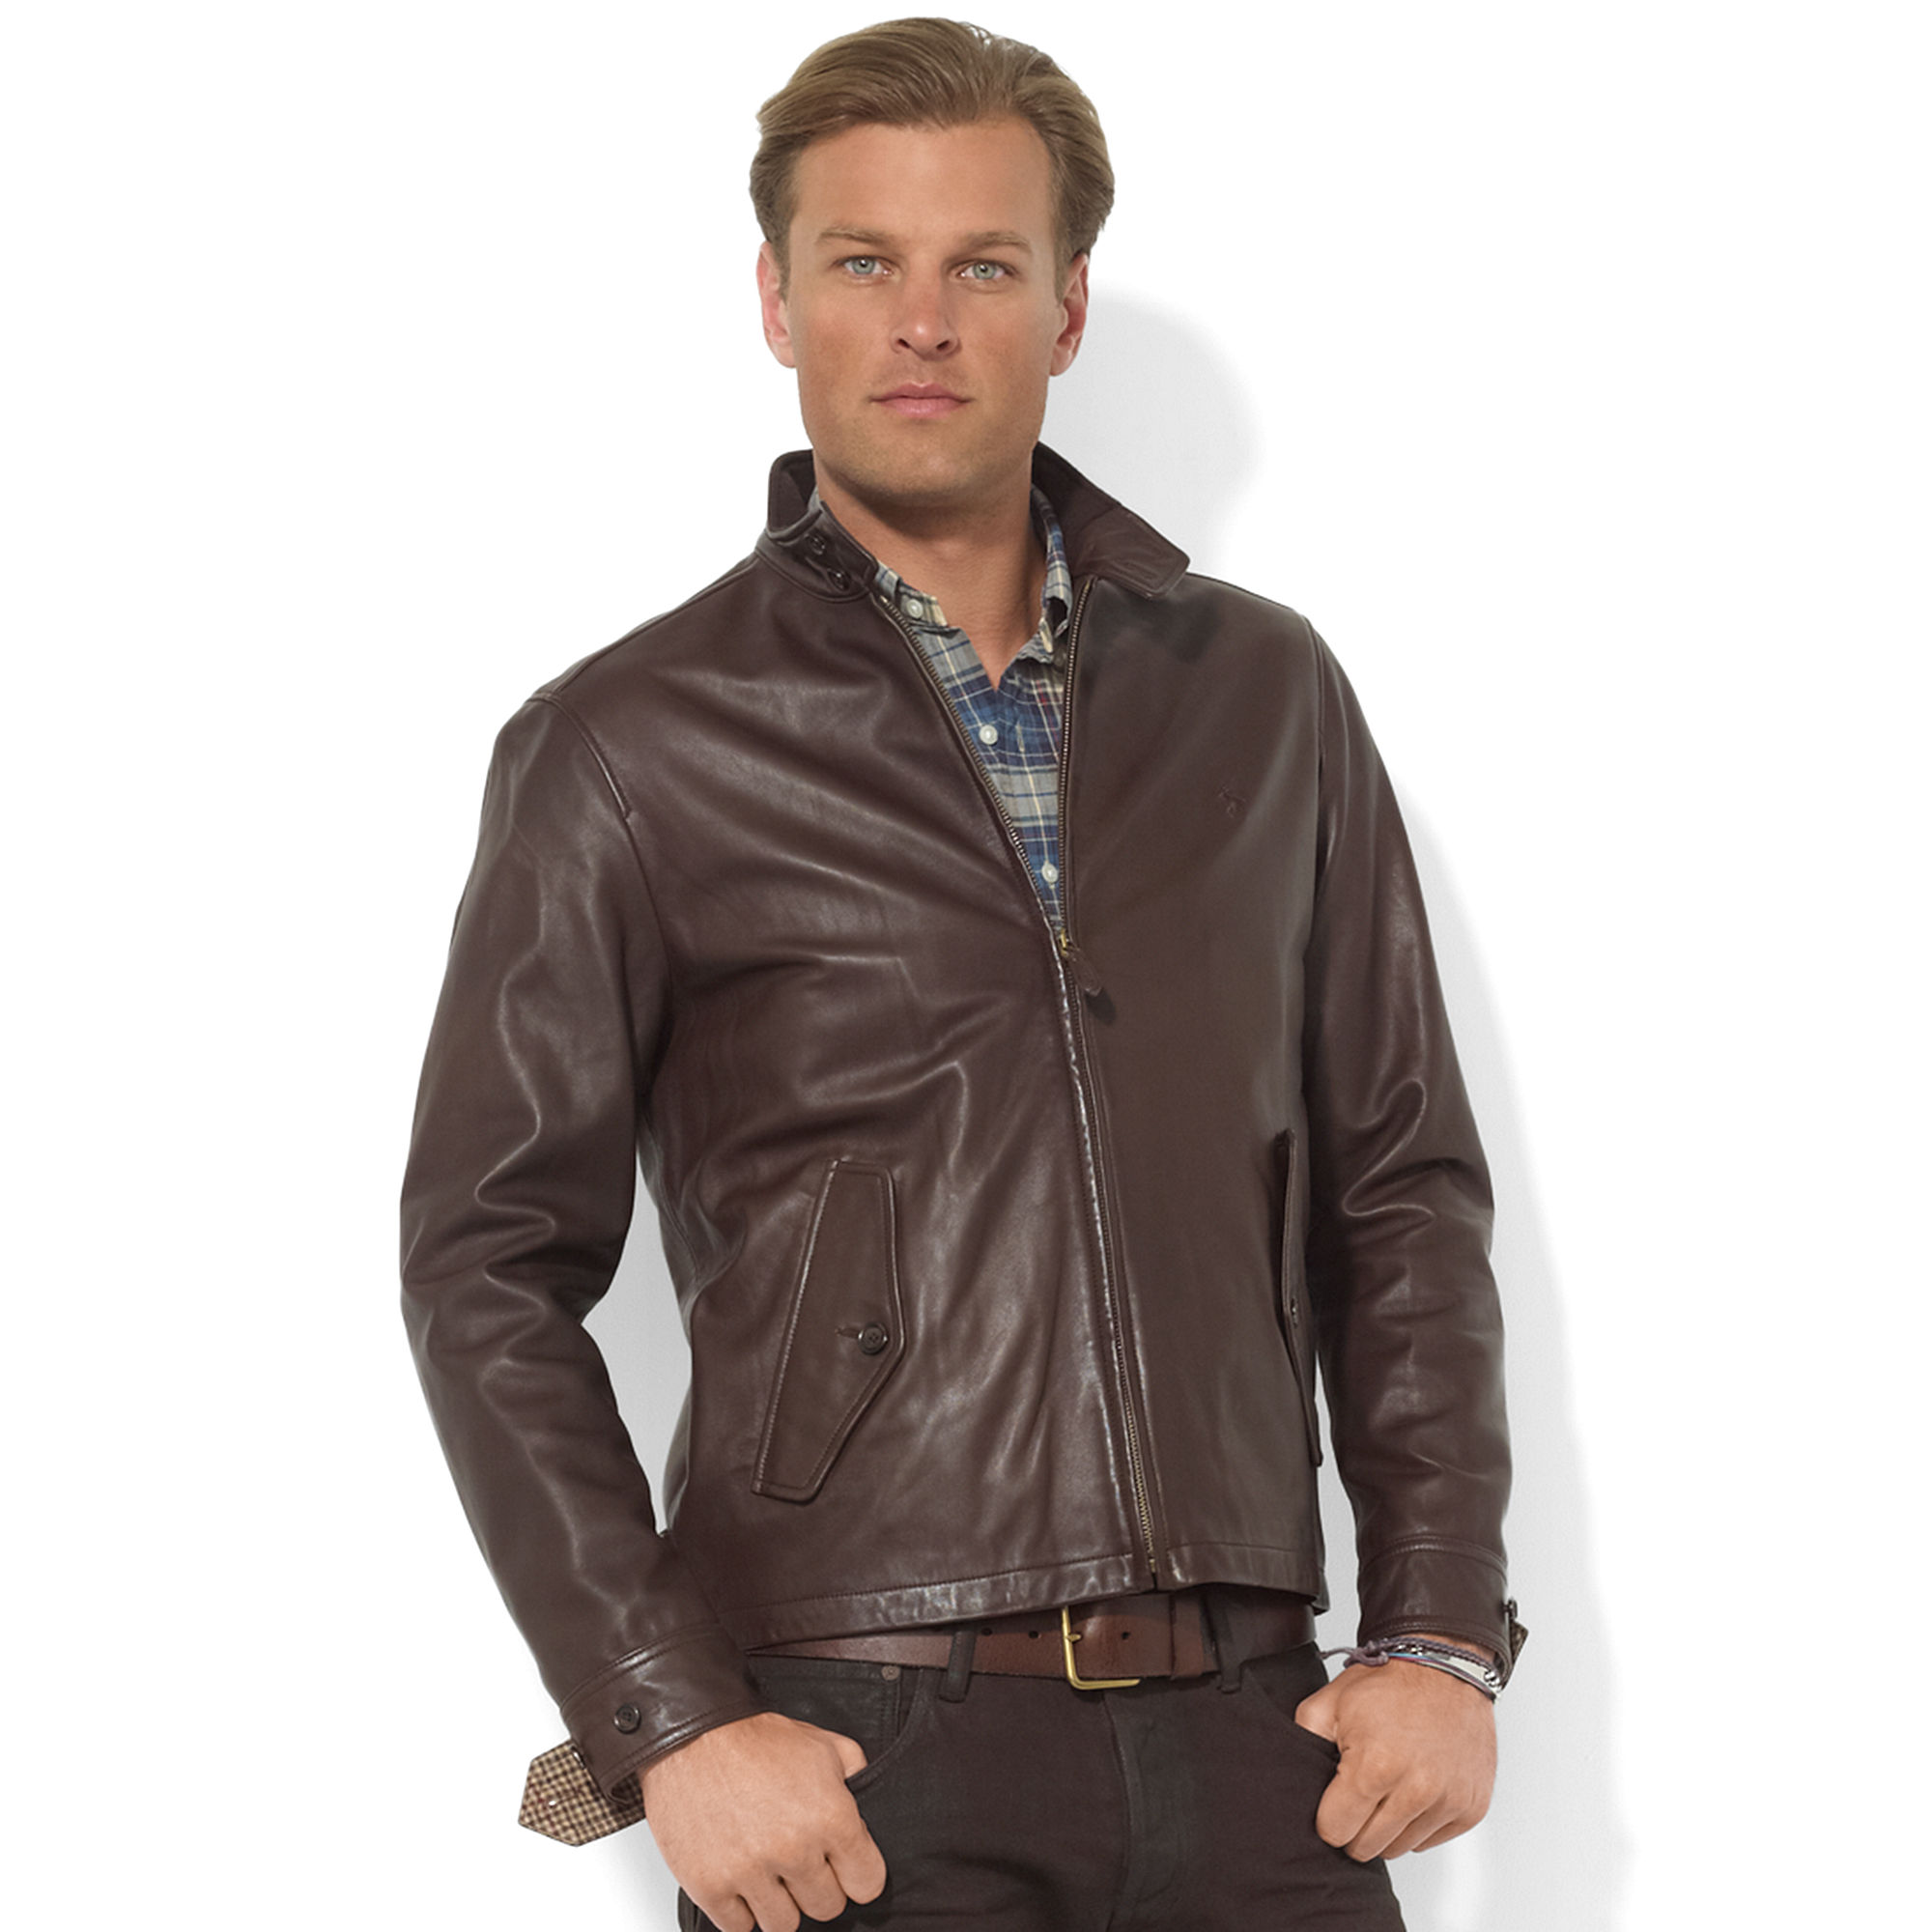 lyst ralph lauren leather barracuda jacket in brown for men. Black Bedroom Furniture Sets. Home Design Ideas